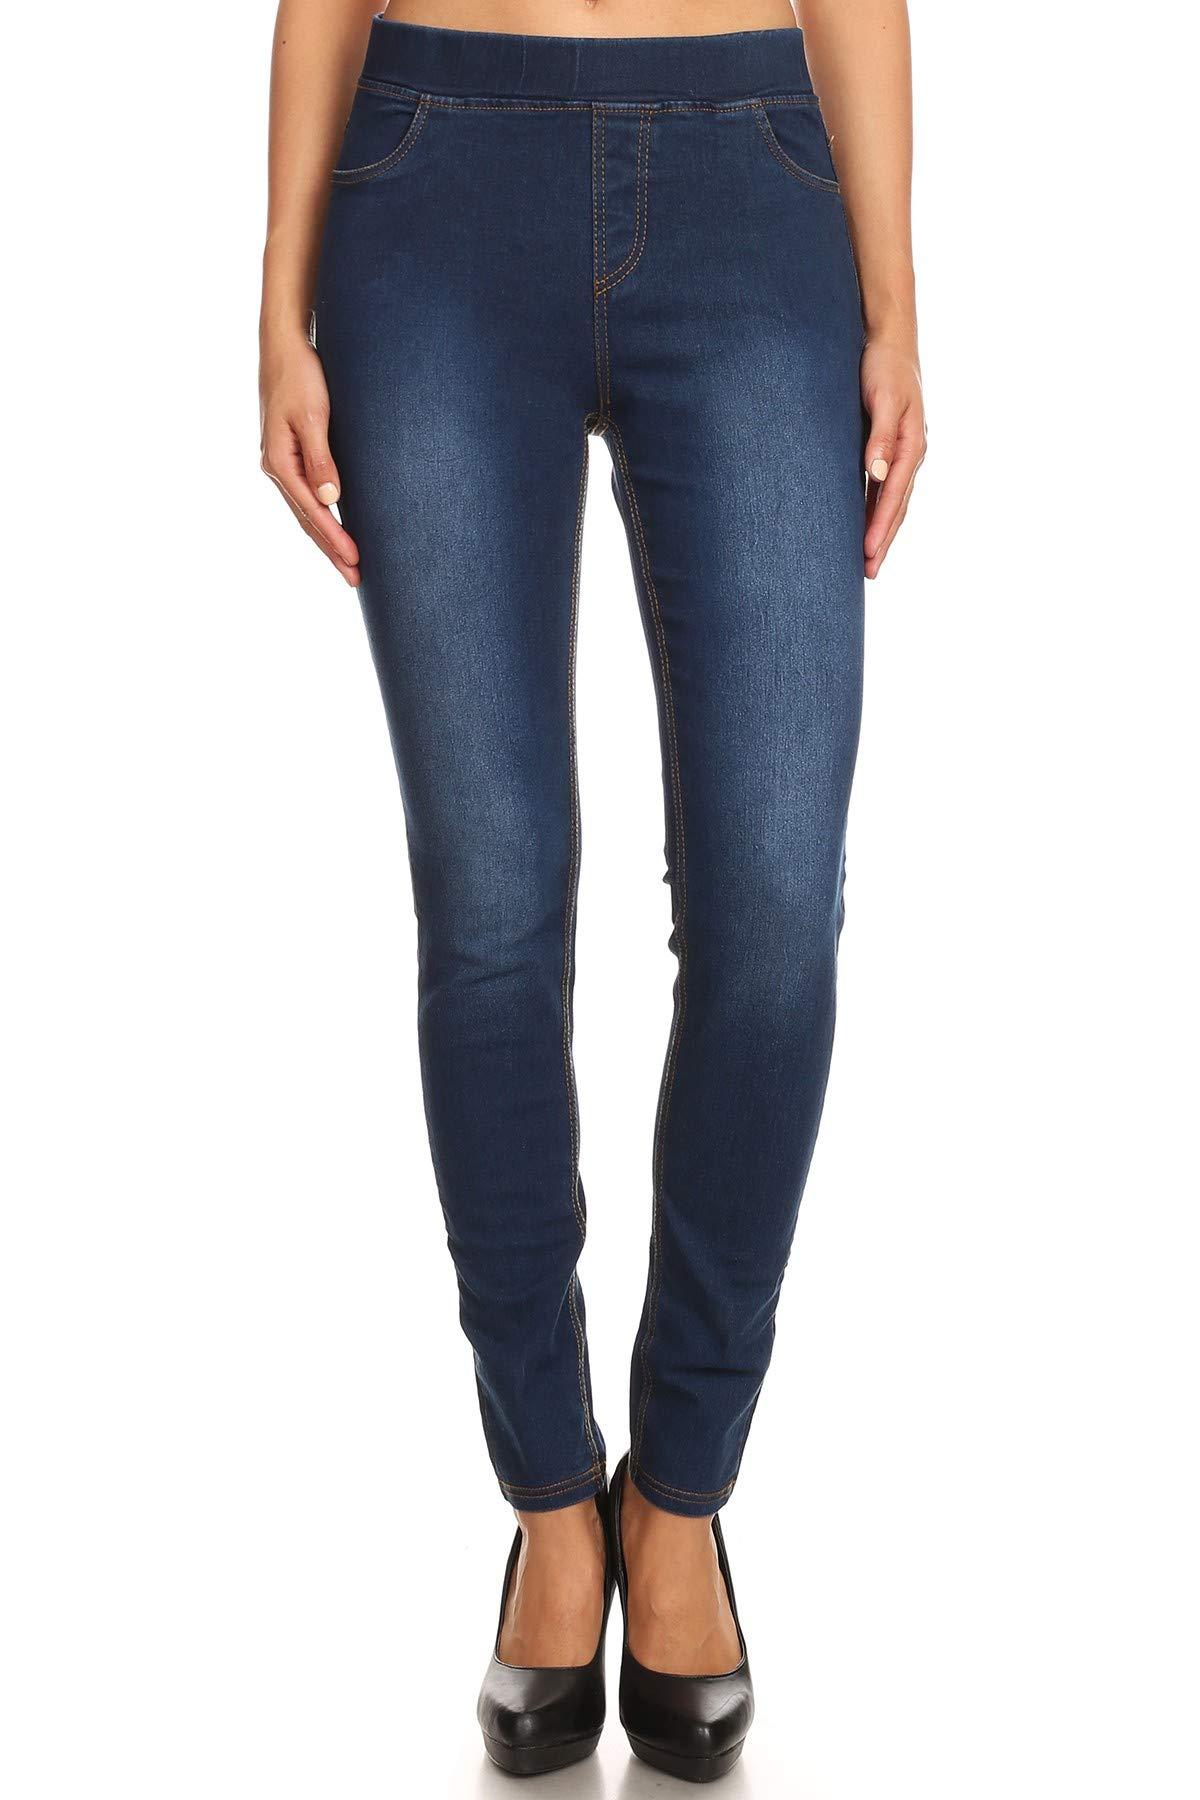 Women's High Waisted Stretchy Pull-On Skinny Denim Jeans Jegging Pants(Medium, Dark Blue)